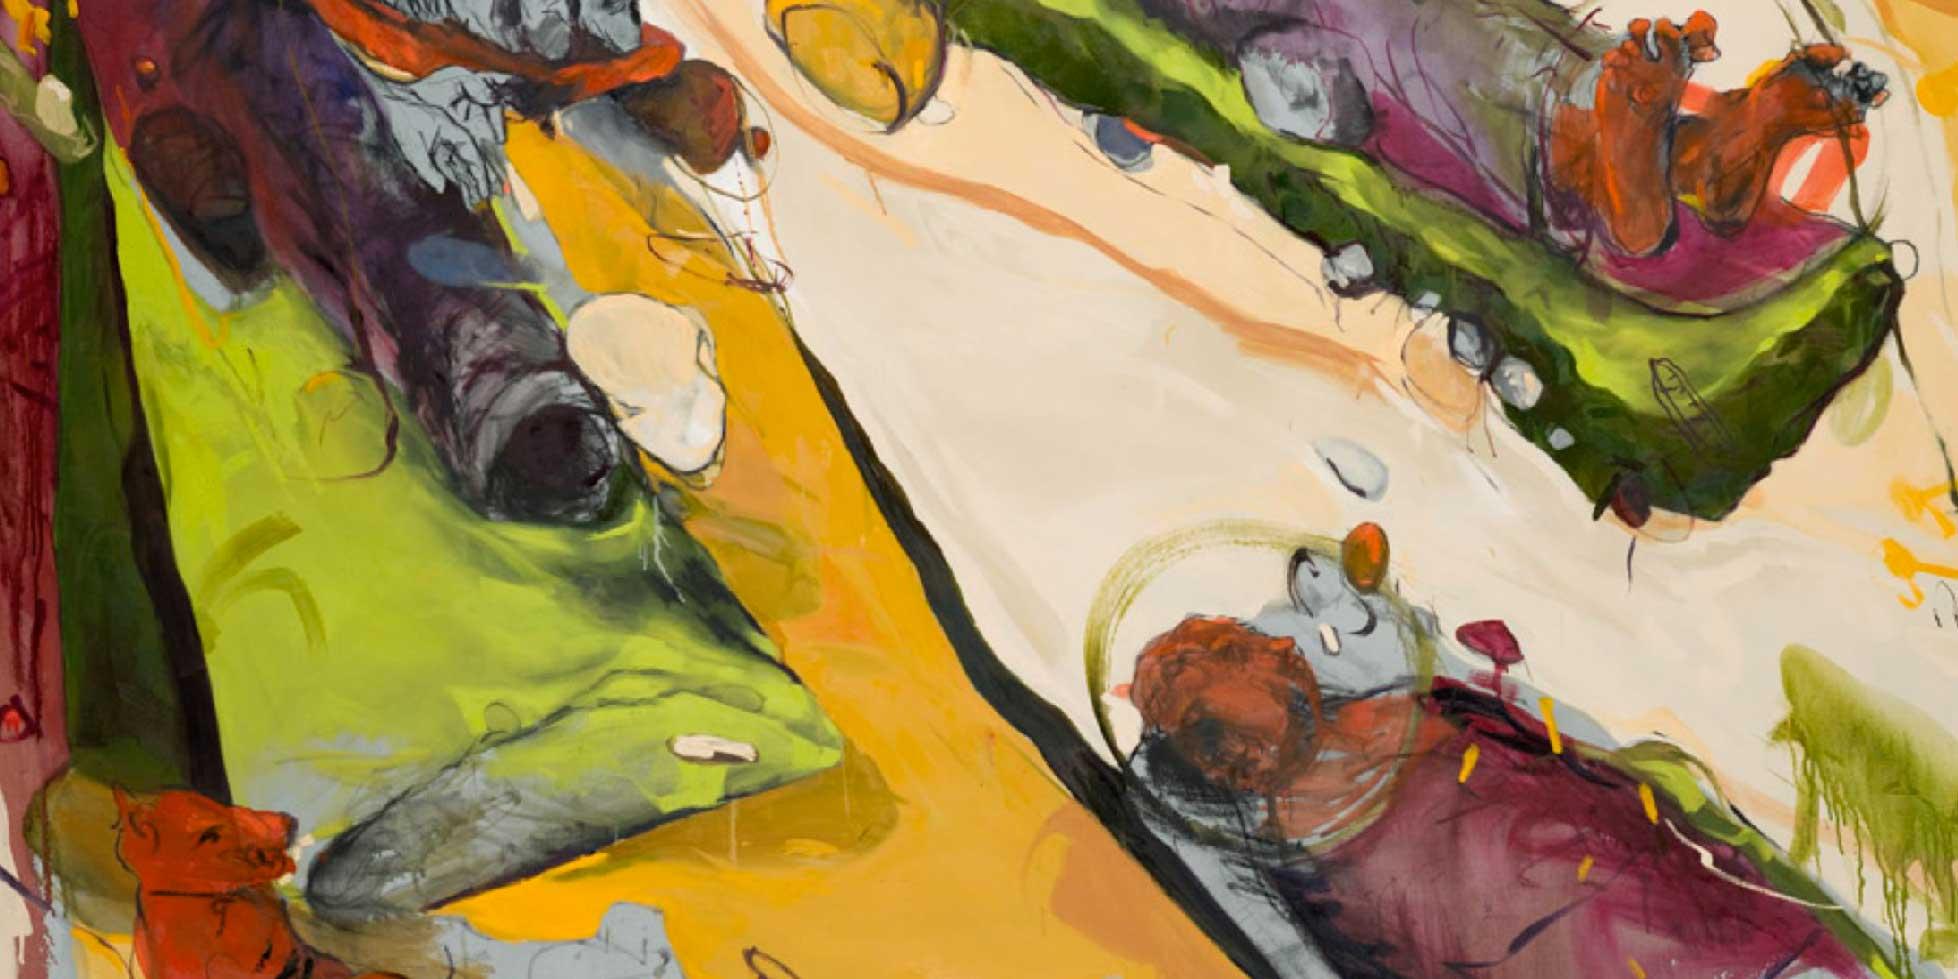 edgard feature image carnaval de fosiles 2007 01 - Obra Reciente / Edgar Rodríguez Luiggi